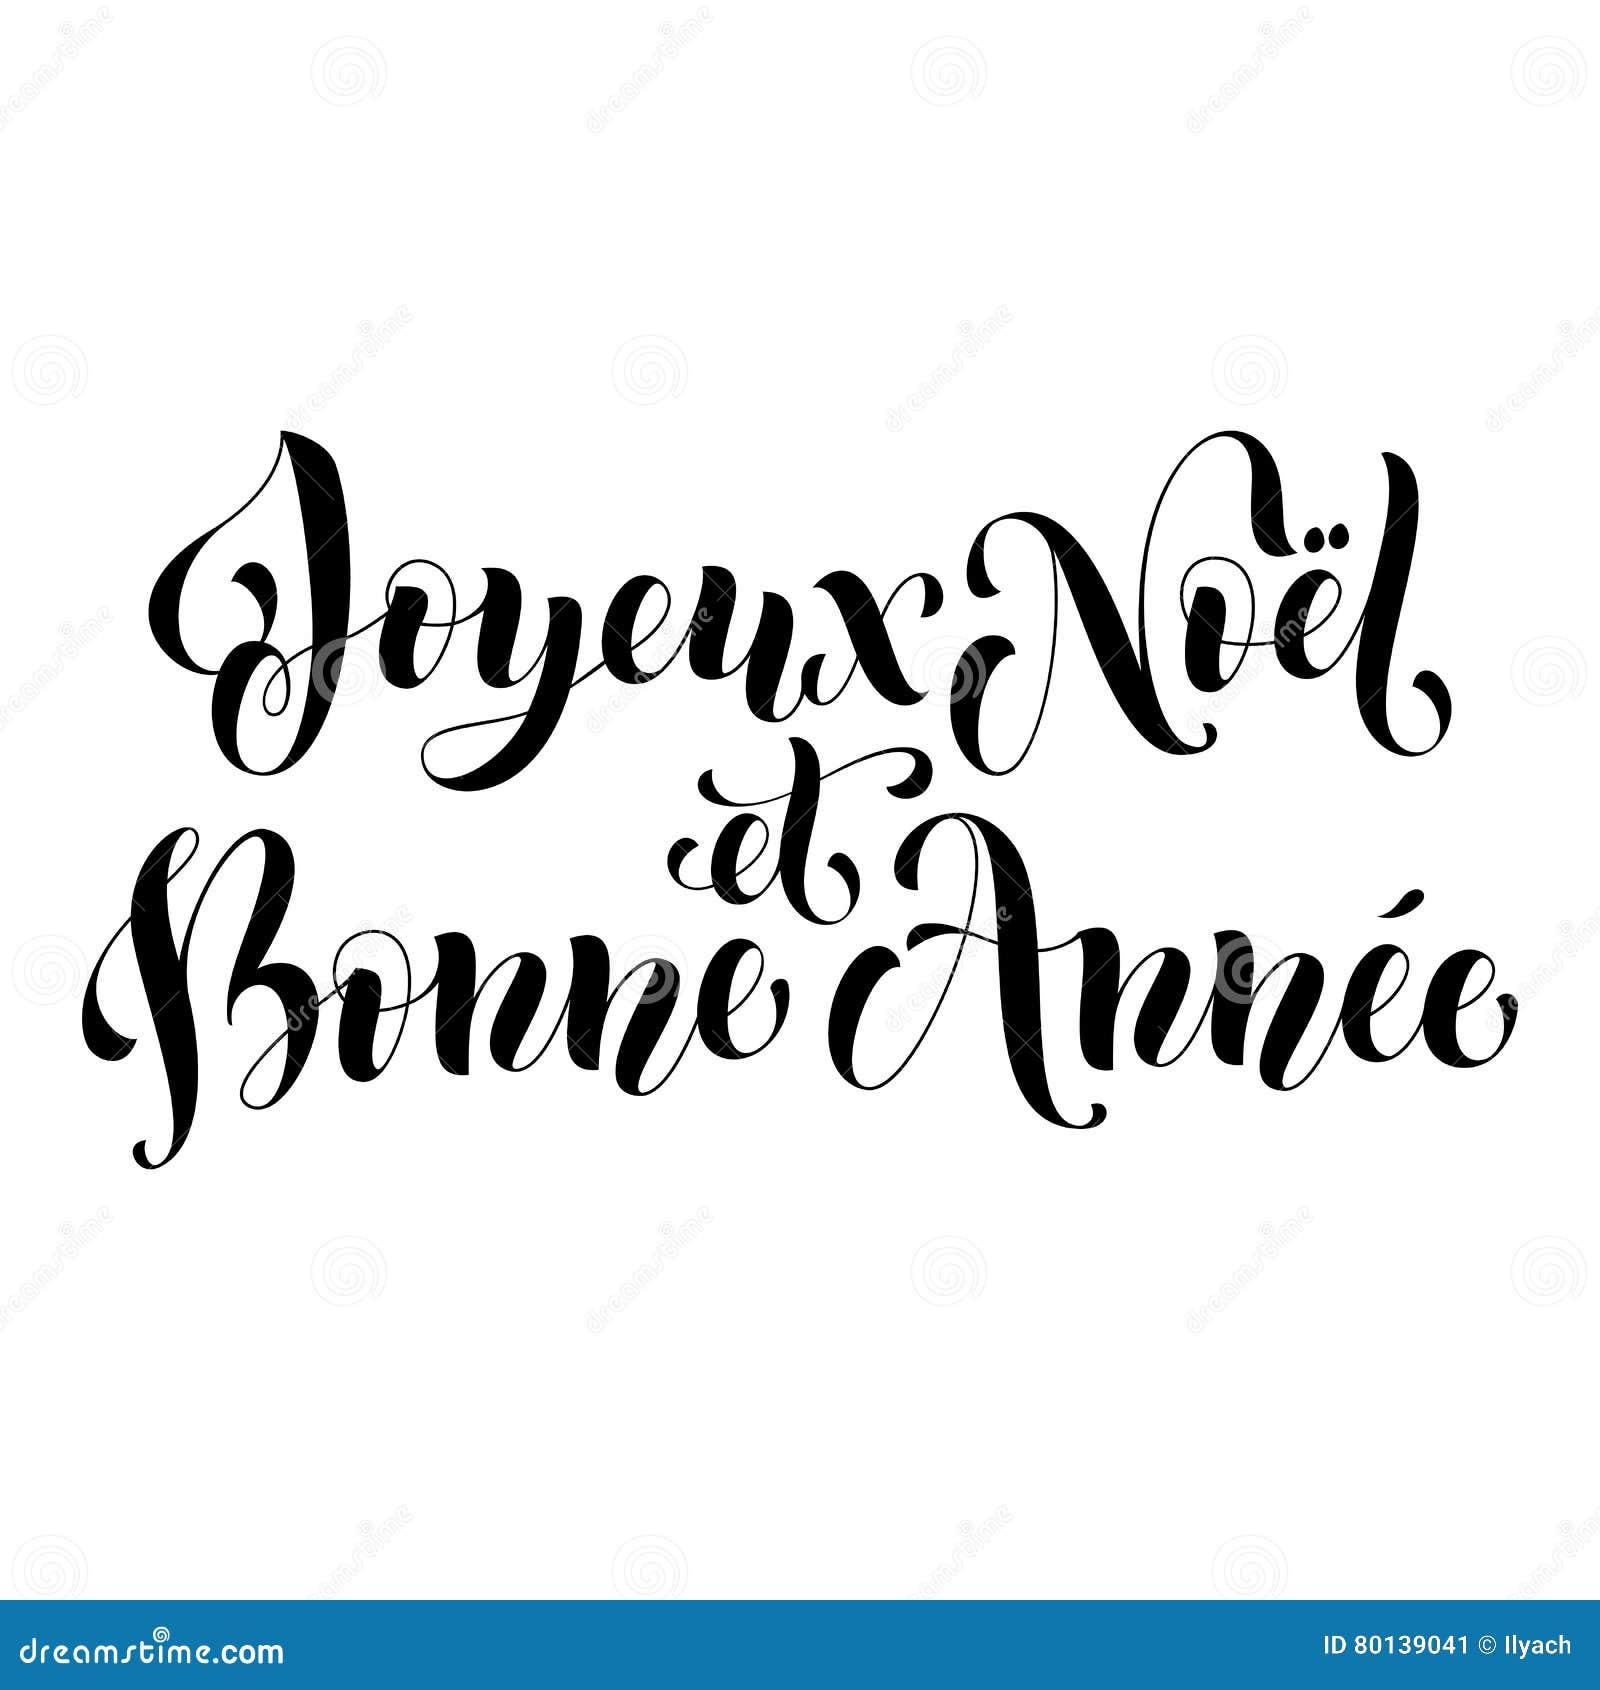 Photos De Joyeux Noel Et Bonne Annee.Joyeux Noel Bonne Annee French Greeting Card Poster Stock